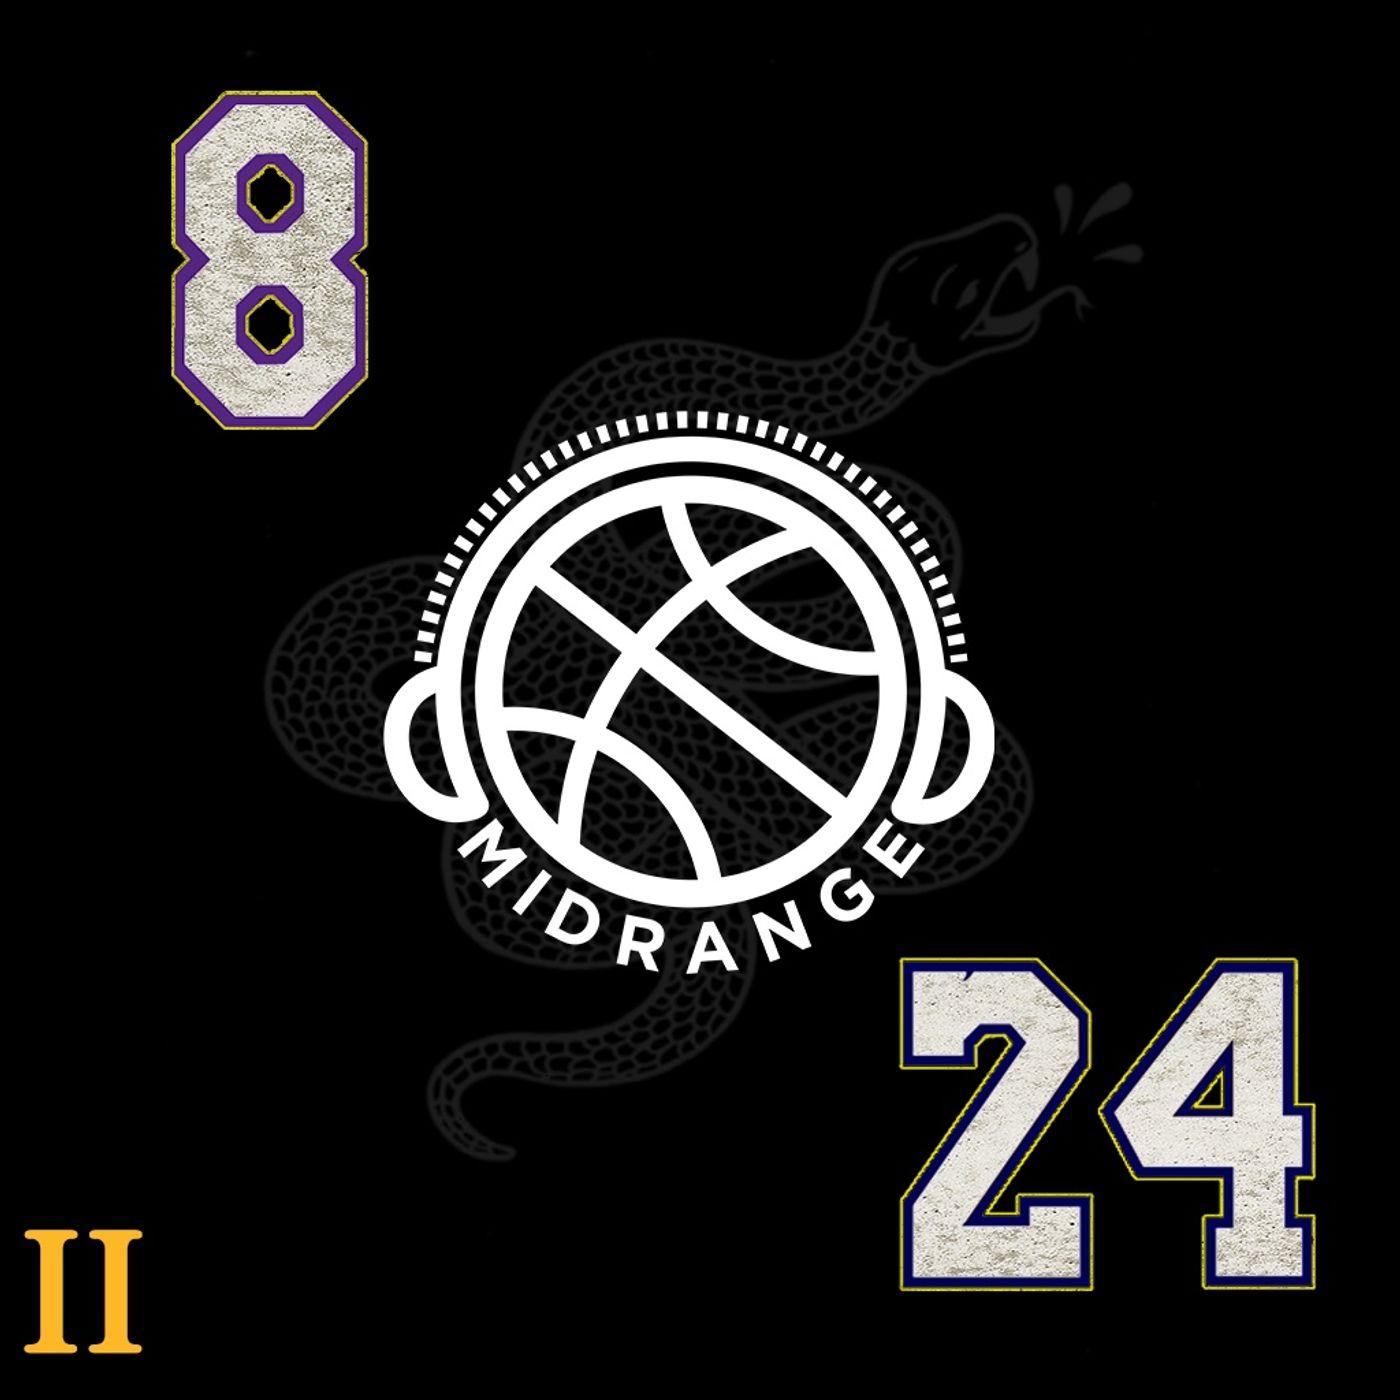 Midrange - Tributo per Kobe Bryant - Parte II